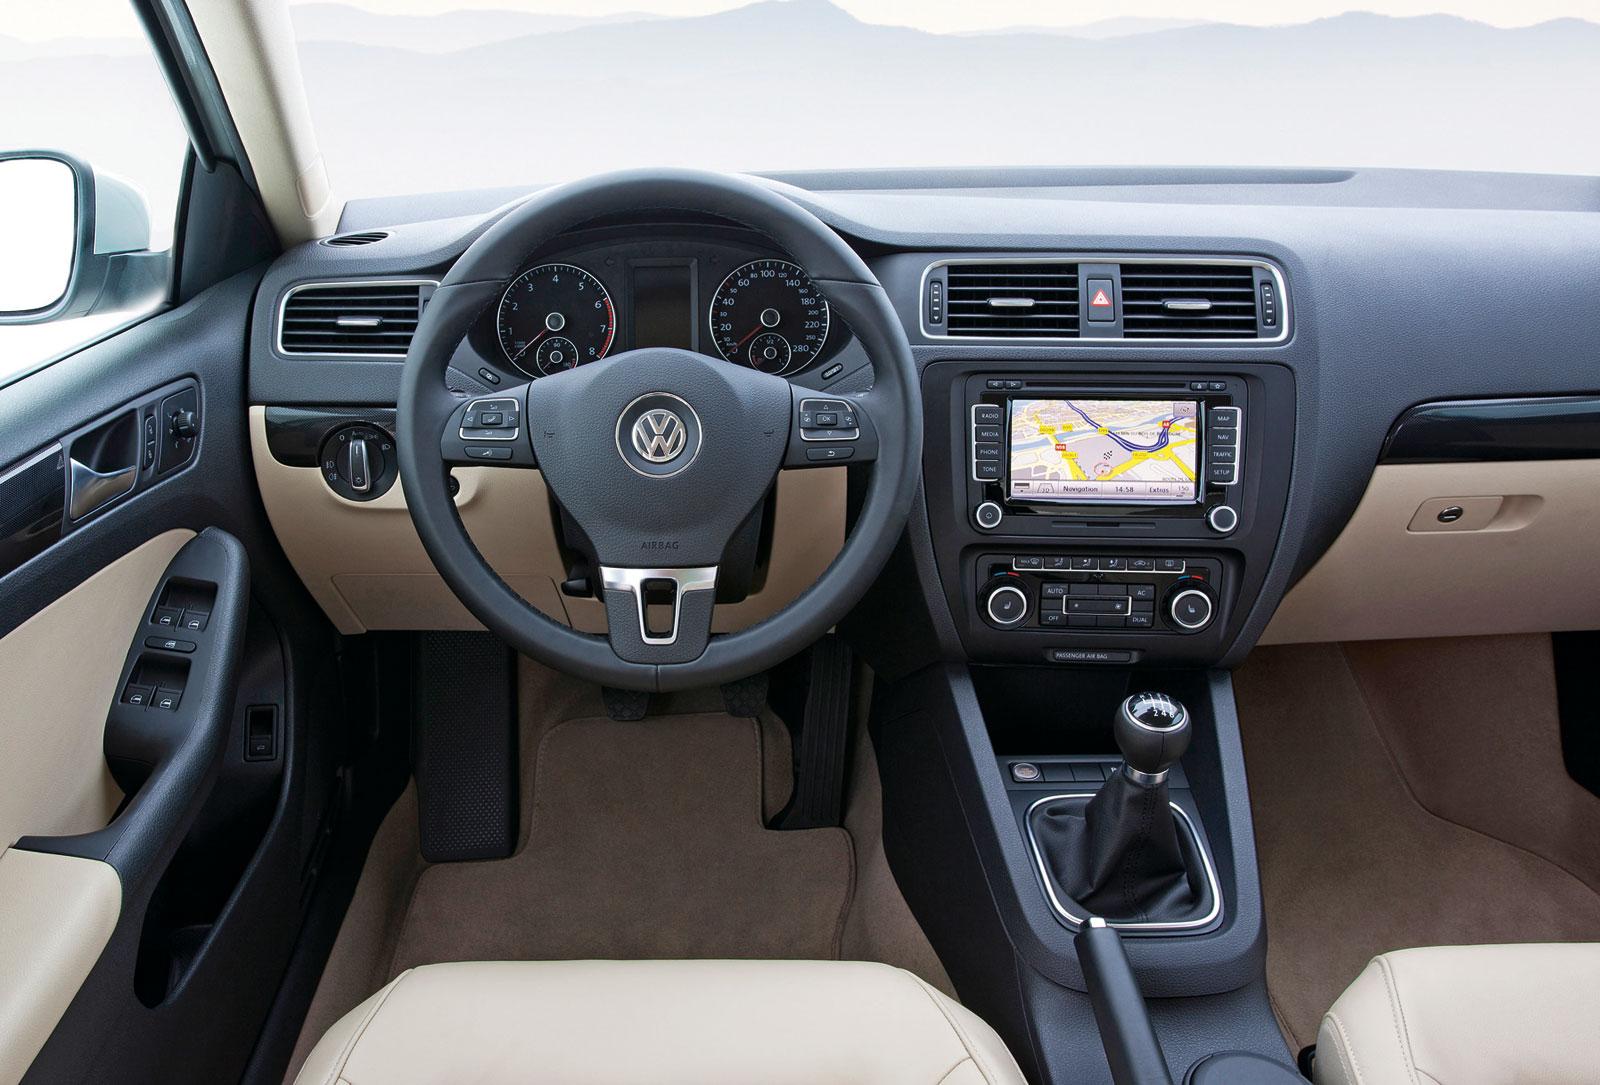 Foto Interiores 5 Volkswagen Jetta Sedan 2011